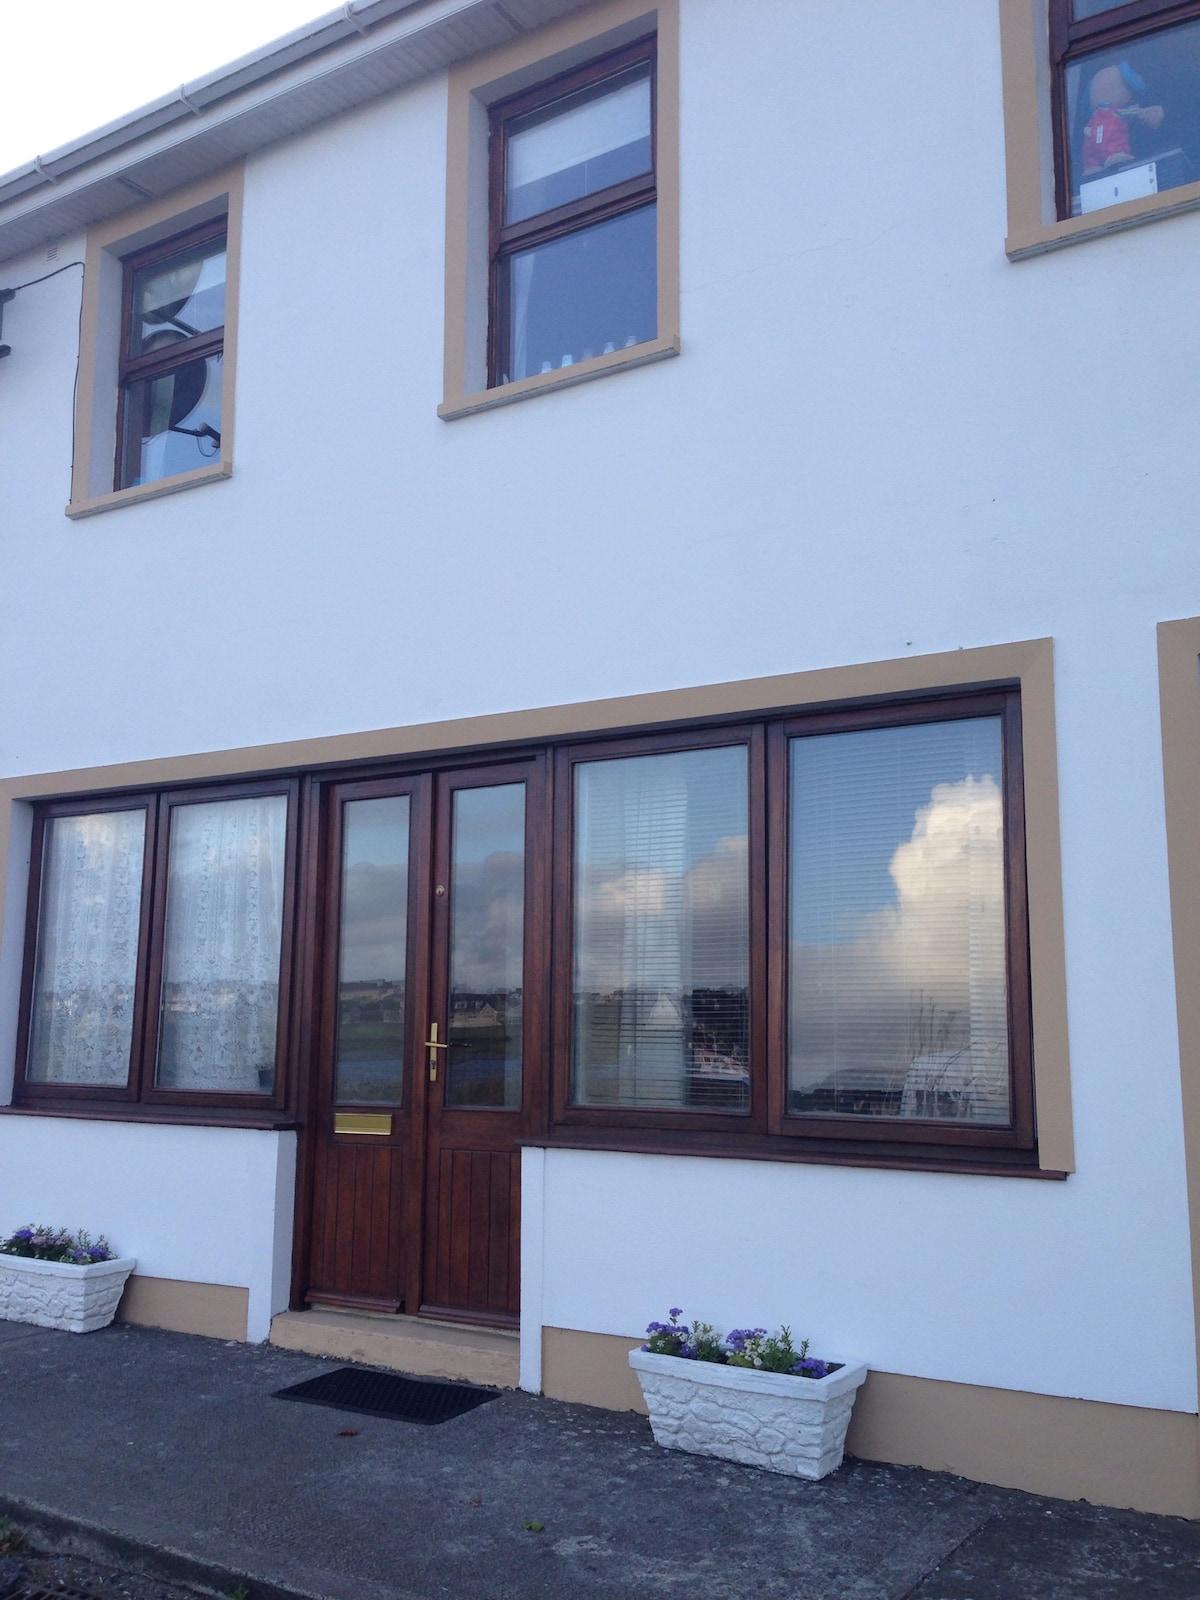 3Bedroom Apt Overlooking Marina